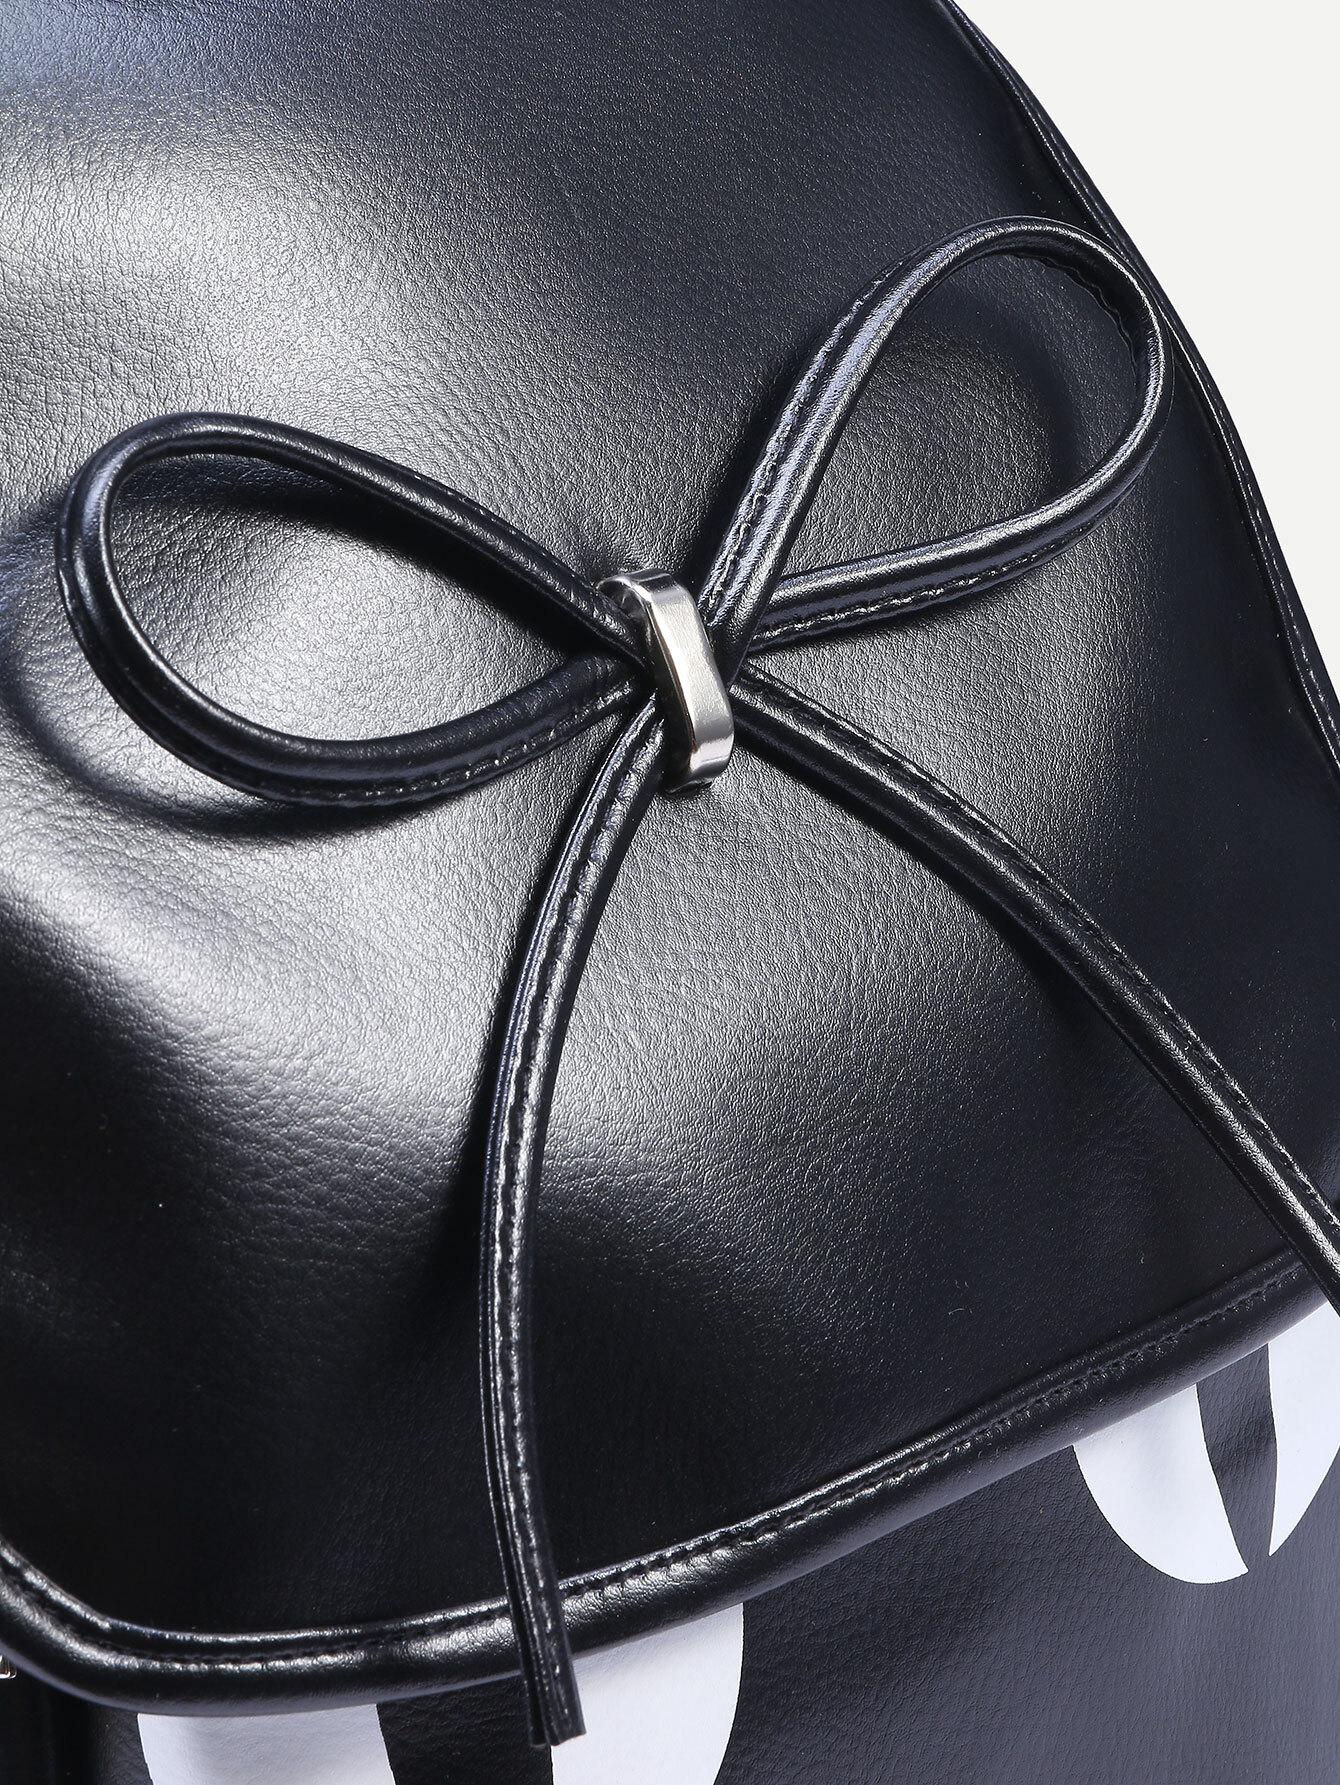 bag160804903_2